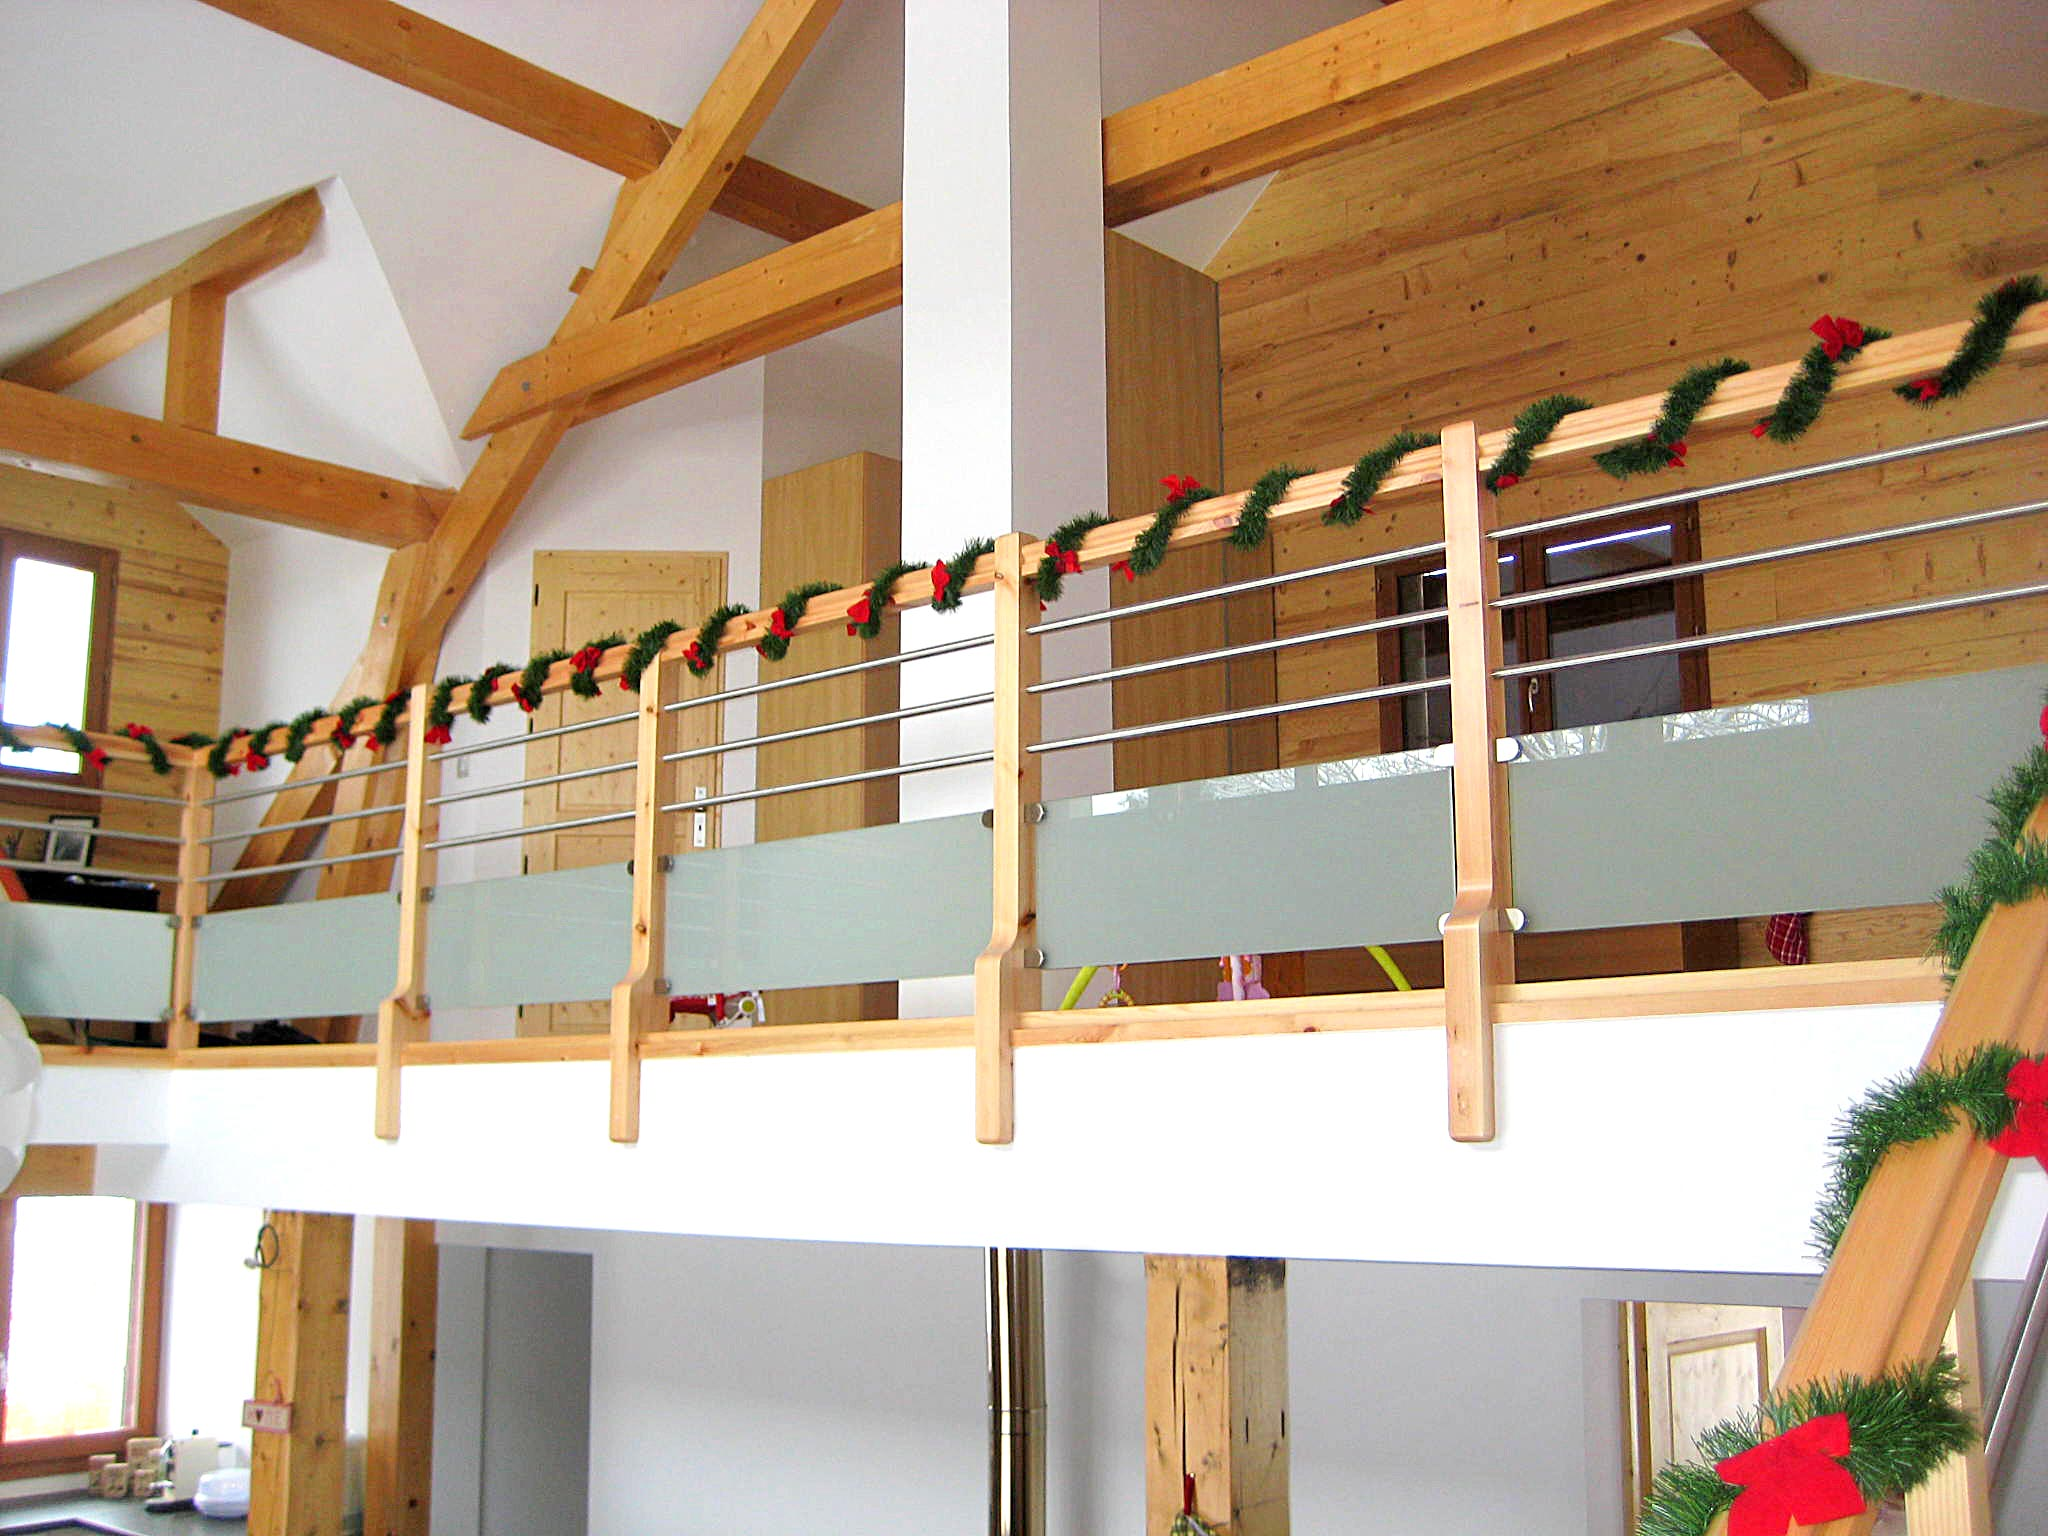 artisan menuisier grenoble escaliers grenoble menuisier. Black Bedroom Furniture Sets. Home Design Ideas